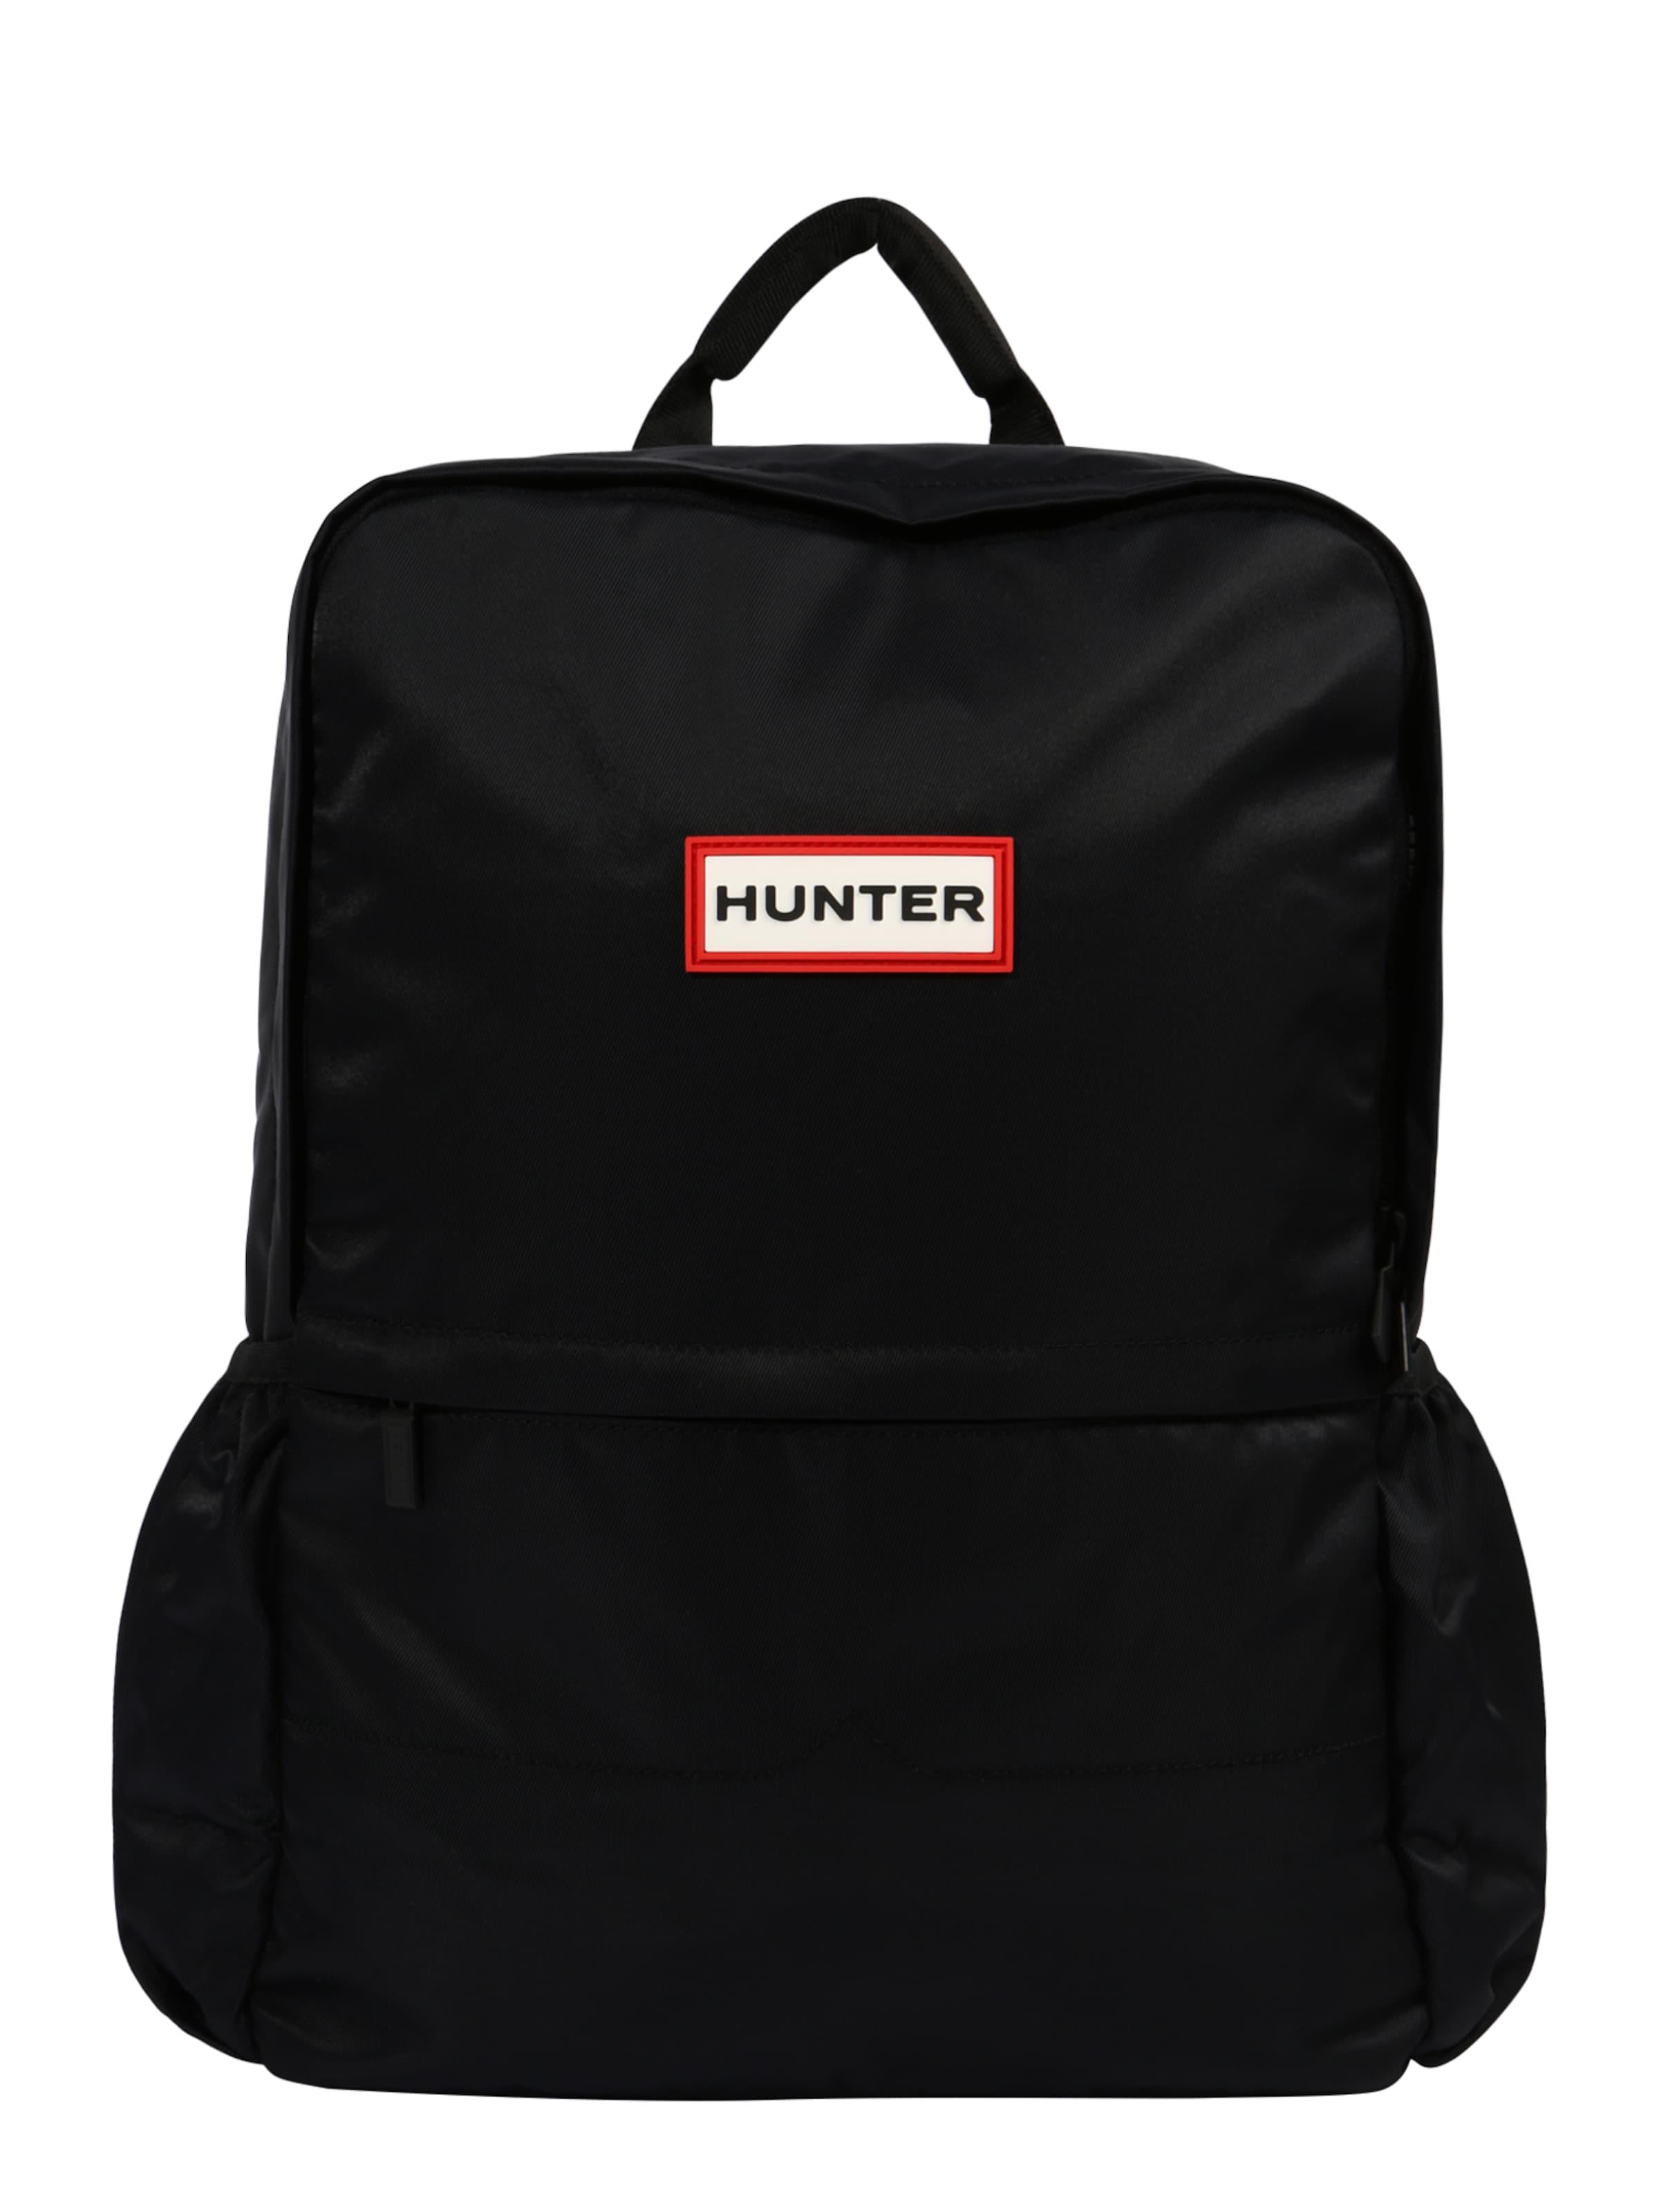 HellrotSchwarz Hunter Weiß 'original In Rucksack Backpack' rhCQtds